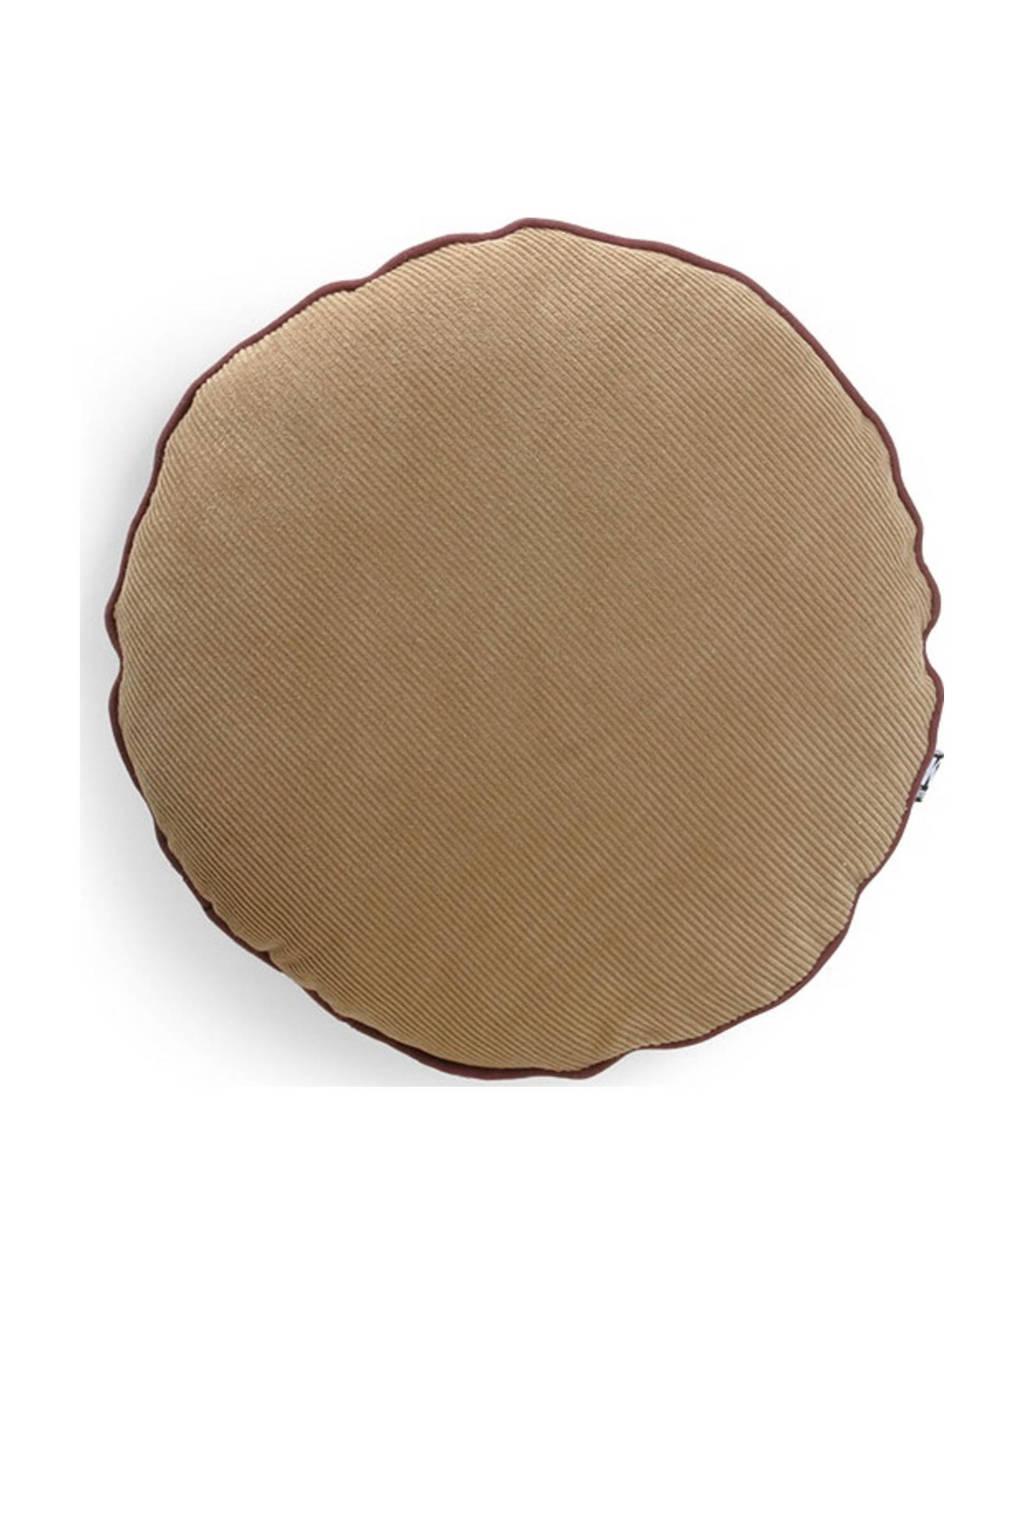 HKliving sierkussen  (Ø 40 cm), Bruin